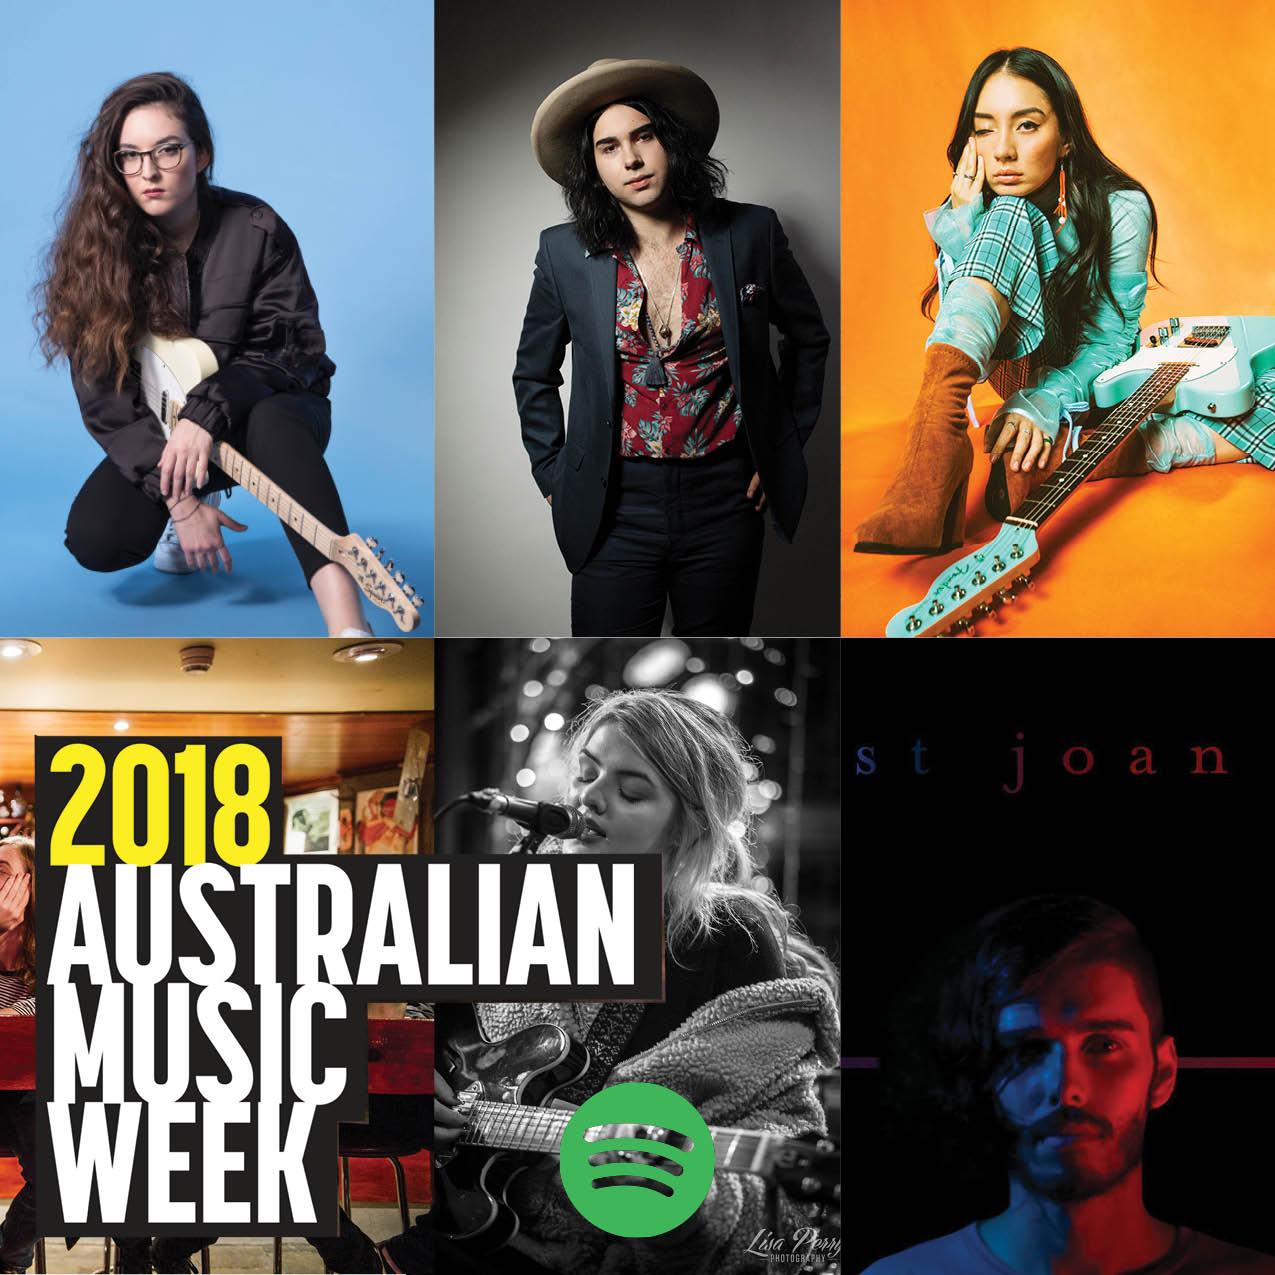 "SPOTIFY PLAYLIST - AUSTRALIAN MUSIC WEEK 2018   https://open.spotify.com/user/australianmusicweek/playlist/1F5t8Xxlcl6HRR2Ji9BYS8?si=GhJCBGWUR5WDqjhHM1NAig  <iframe src=""https://open.spotify.com/embed/user/australianmusicweek/playlist/1F5t8Xxlcl6HRR2Ji9BYS8"" width=""300"" height=""380"" frameborder=""0"" allowtransparency=""true"" allow=""encrypted-media""></iframe>"